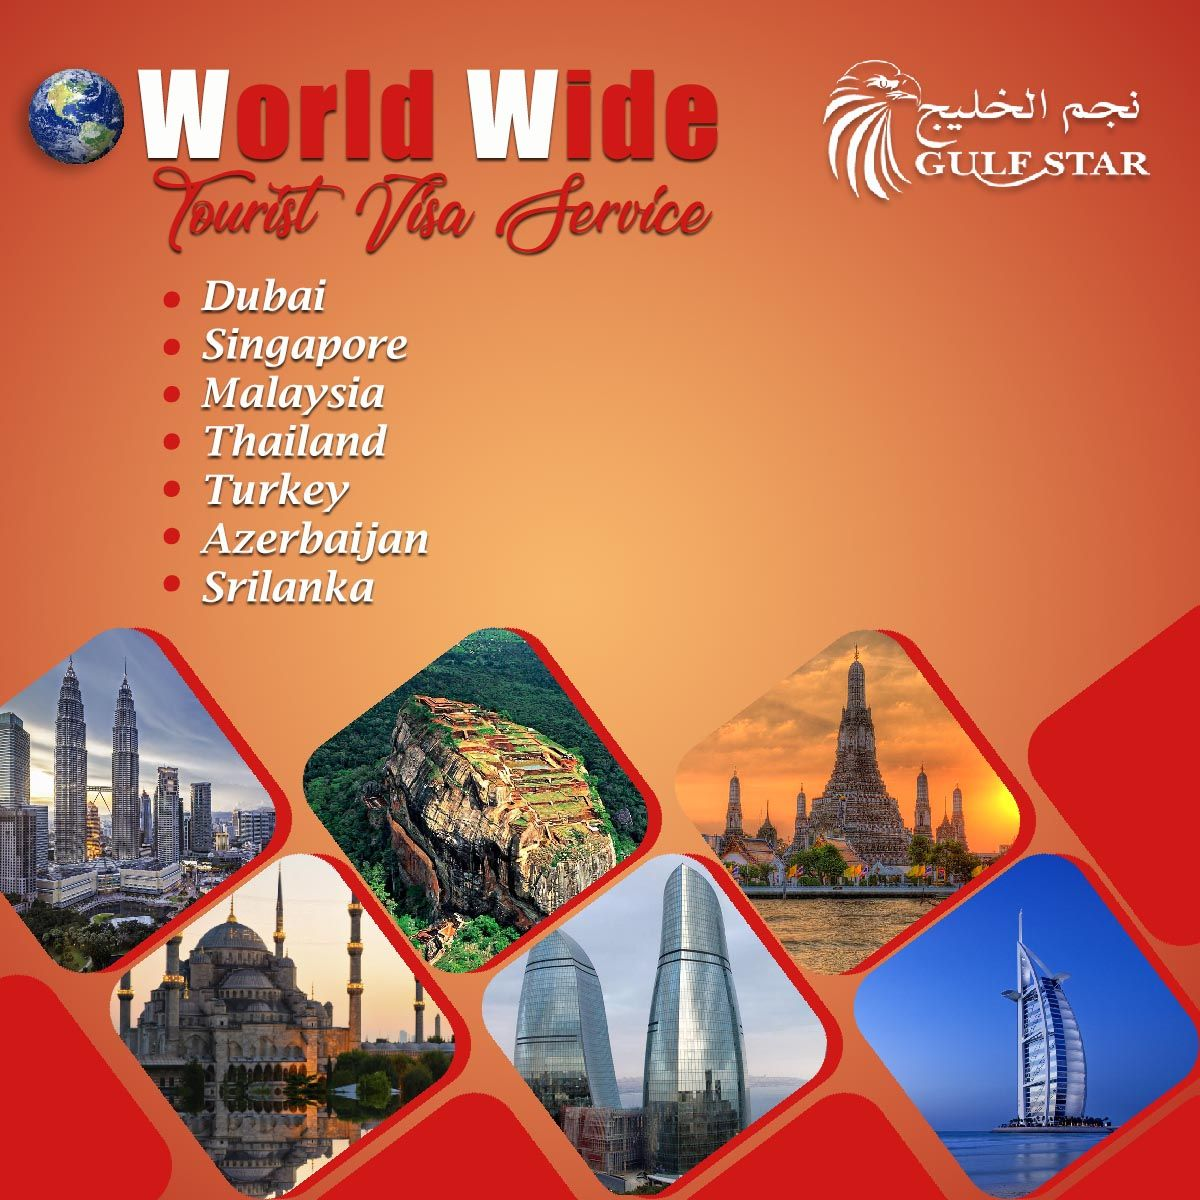 World Wide Tourist Visa Service Singapore Malaysia Thailand Turkey Azerbaijan Srilanka Travel And Tourism Tourism Singapore Malaysia